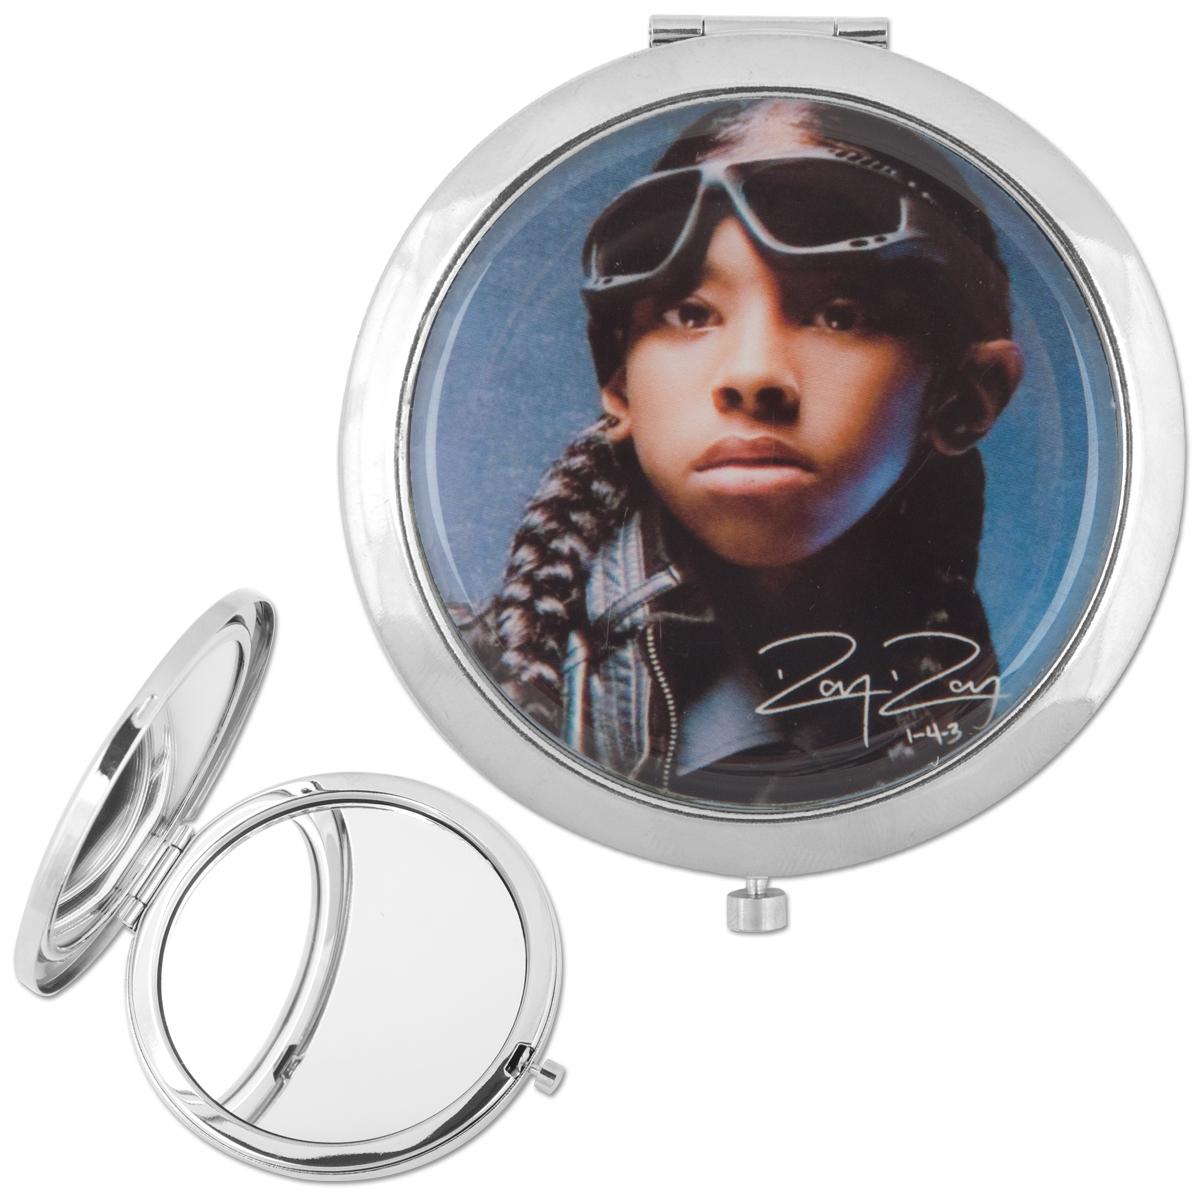 Mindless Behavior Ray Ray Mirror Compact